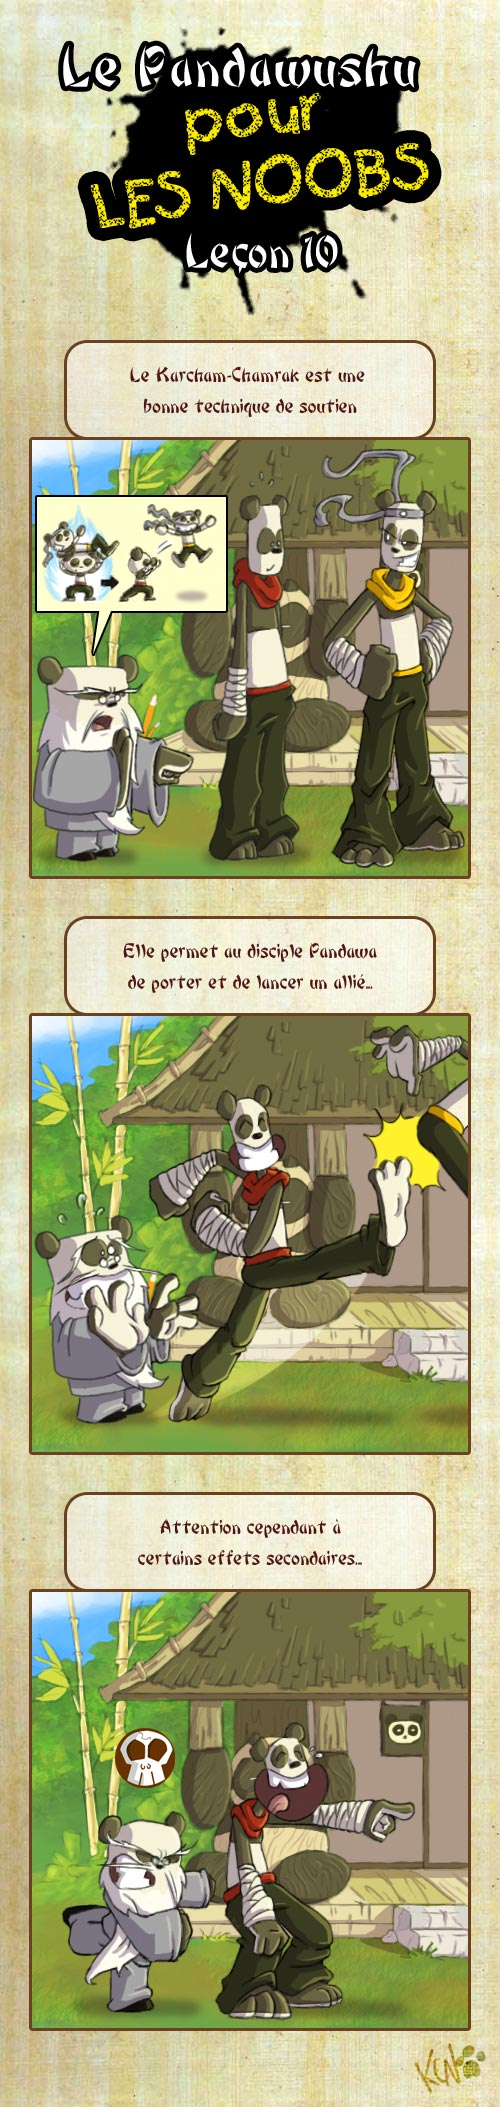 Le Pandawushu pour les Noobs Pandawushu10